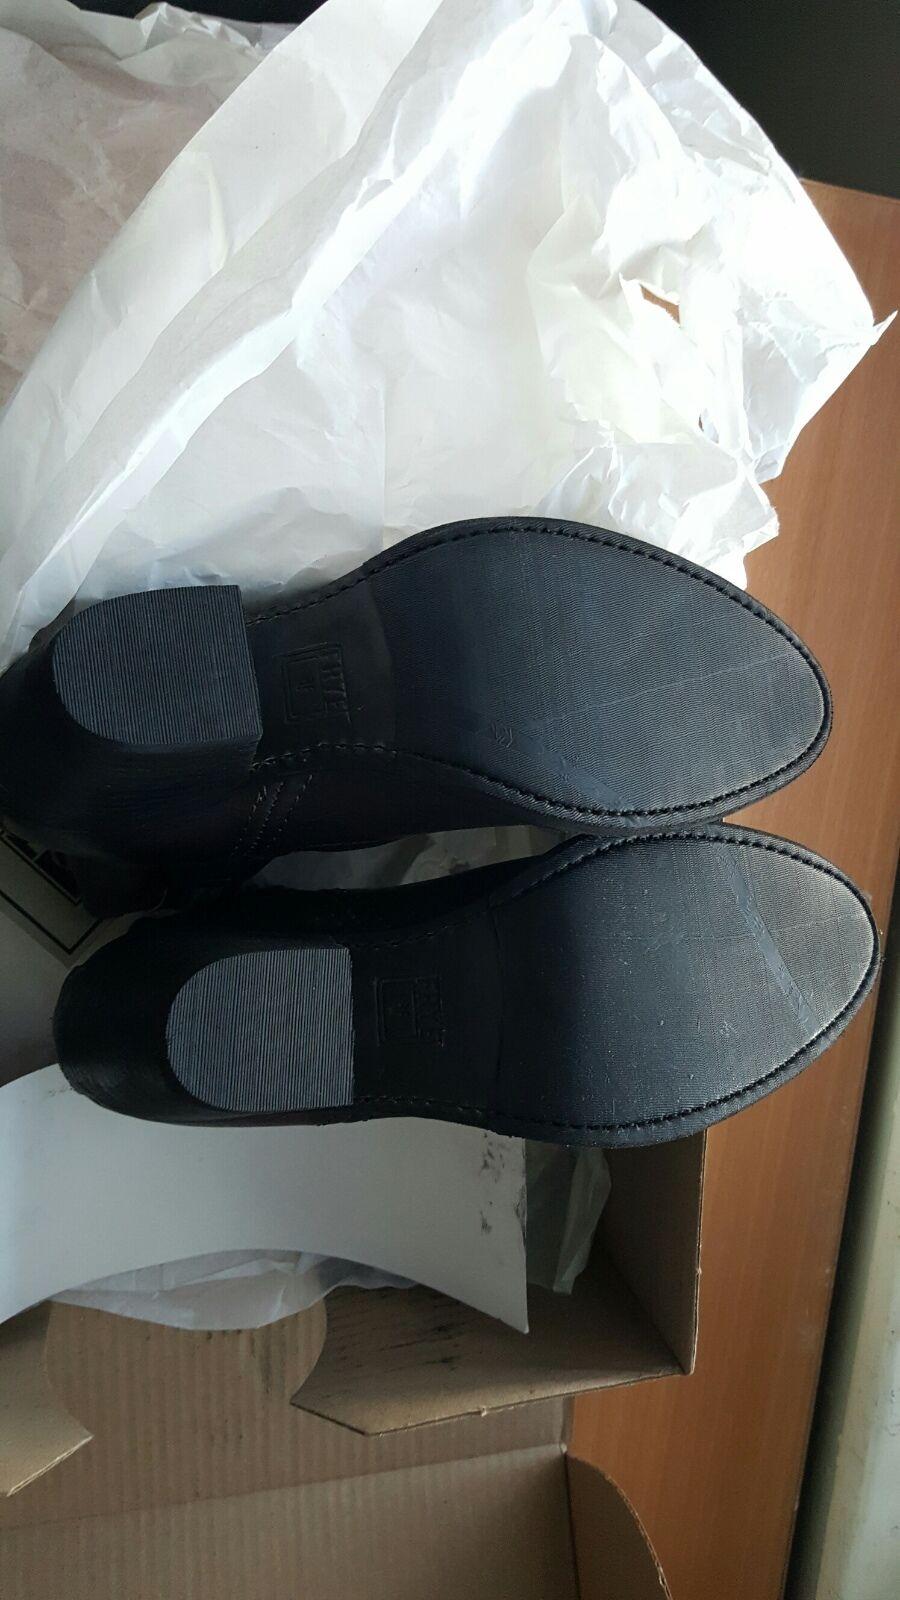 FRYE NIB  398 leslie artisan short charcoal grey boots boots boots shoes US 7.5 M 3faf23